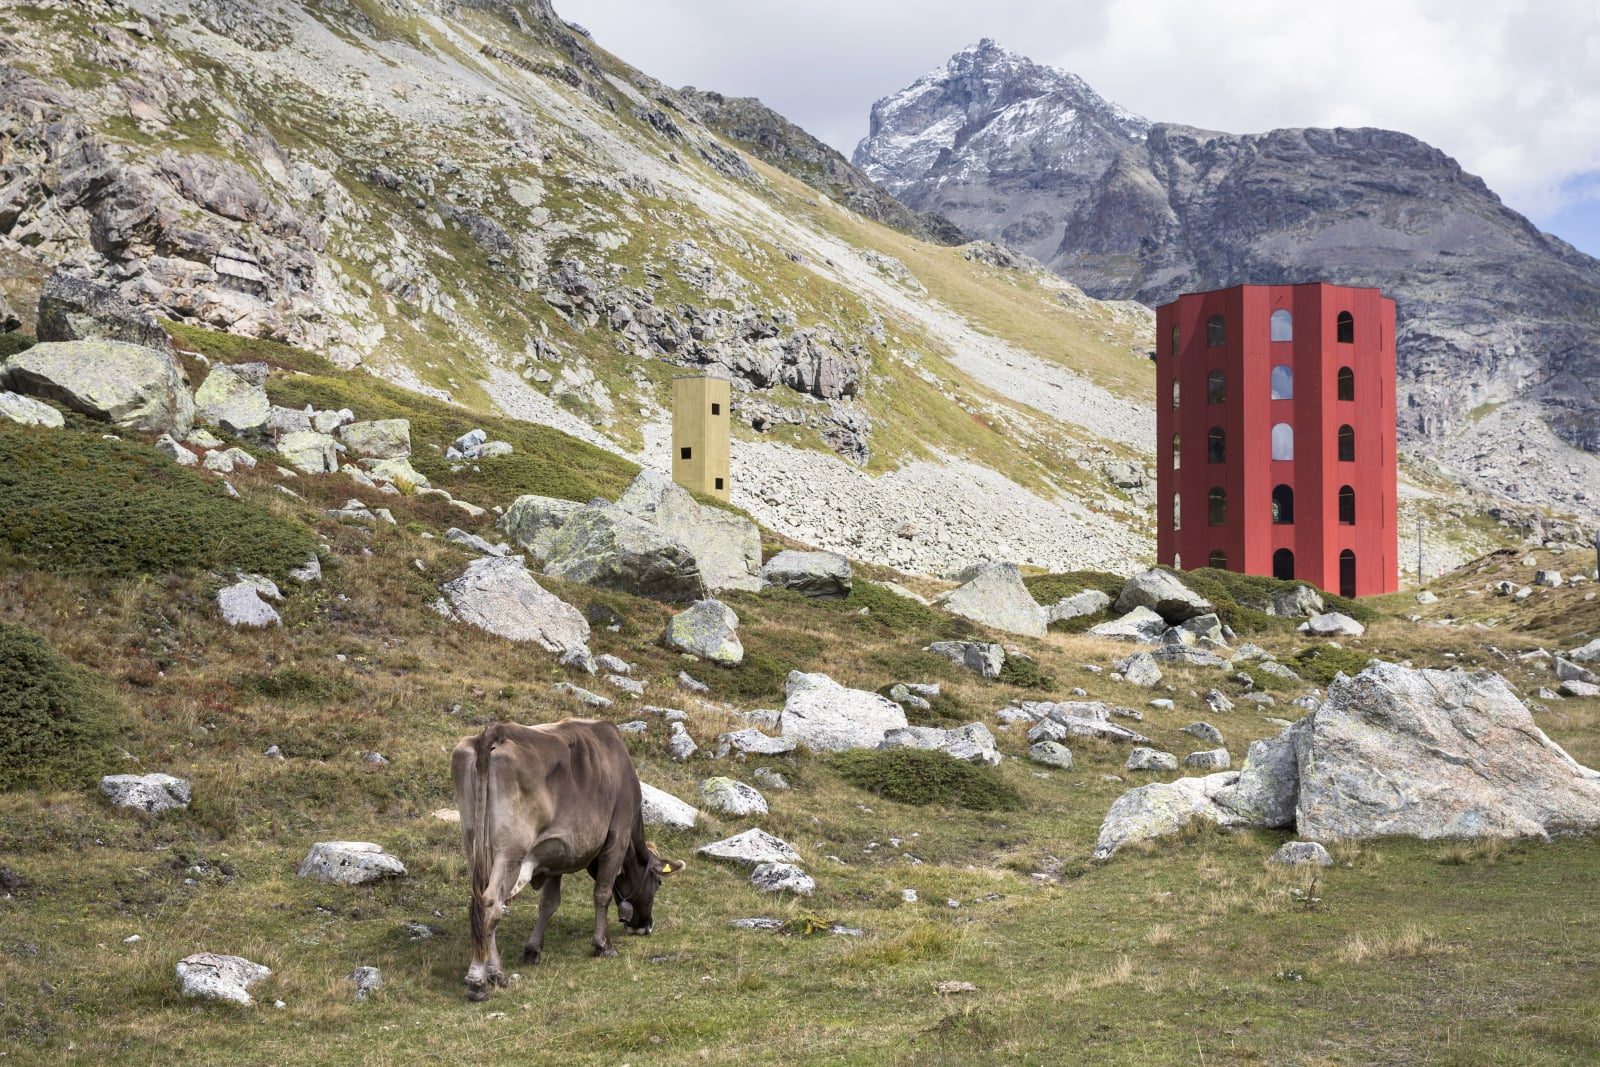 Krowa je trawę w pobliżu teatru Origen, Szwajcaria. Fot. PAP/EPA/PETER KLAUNZER